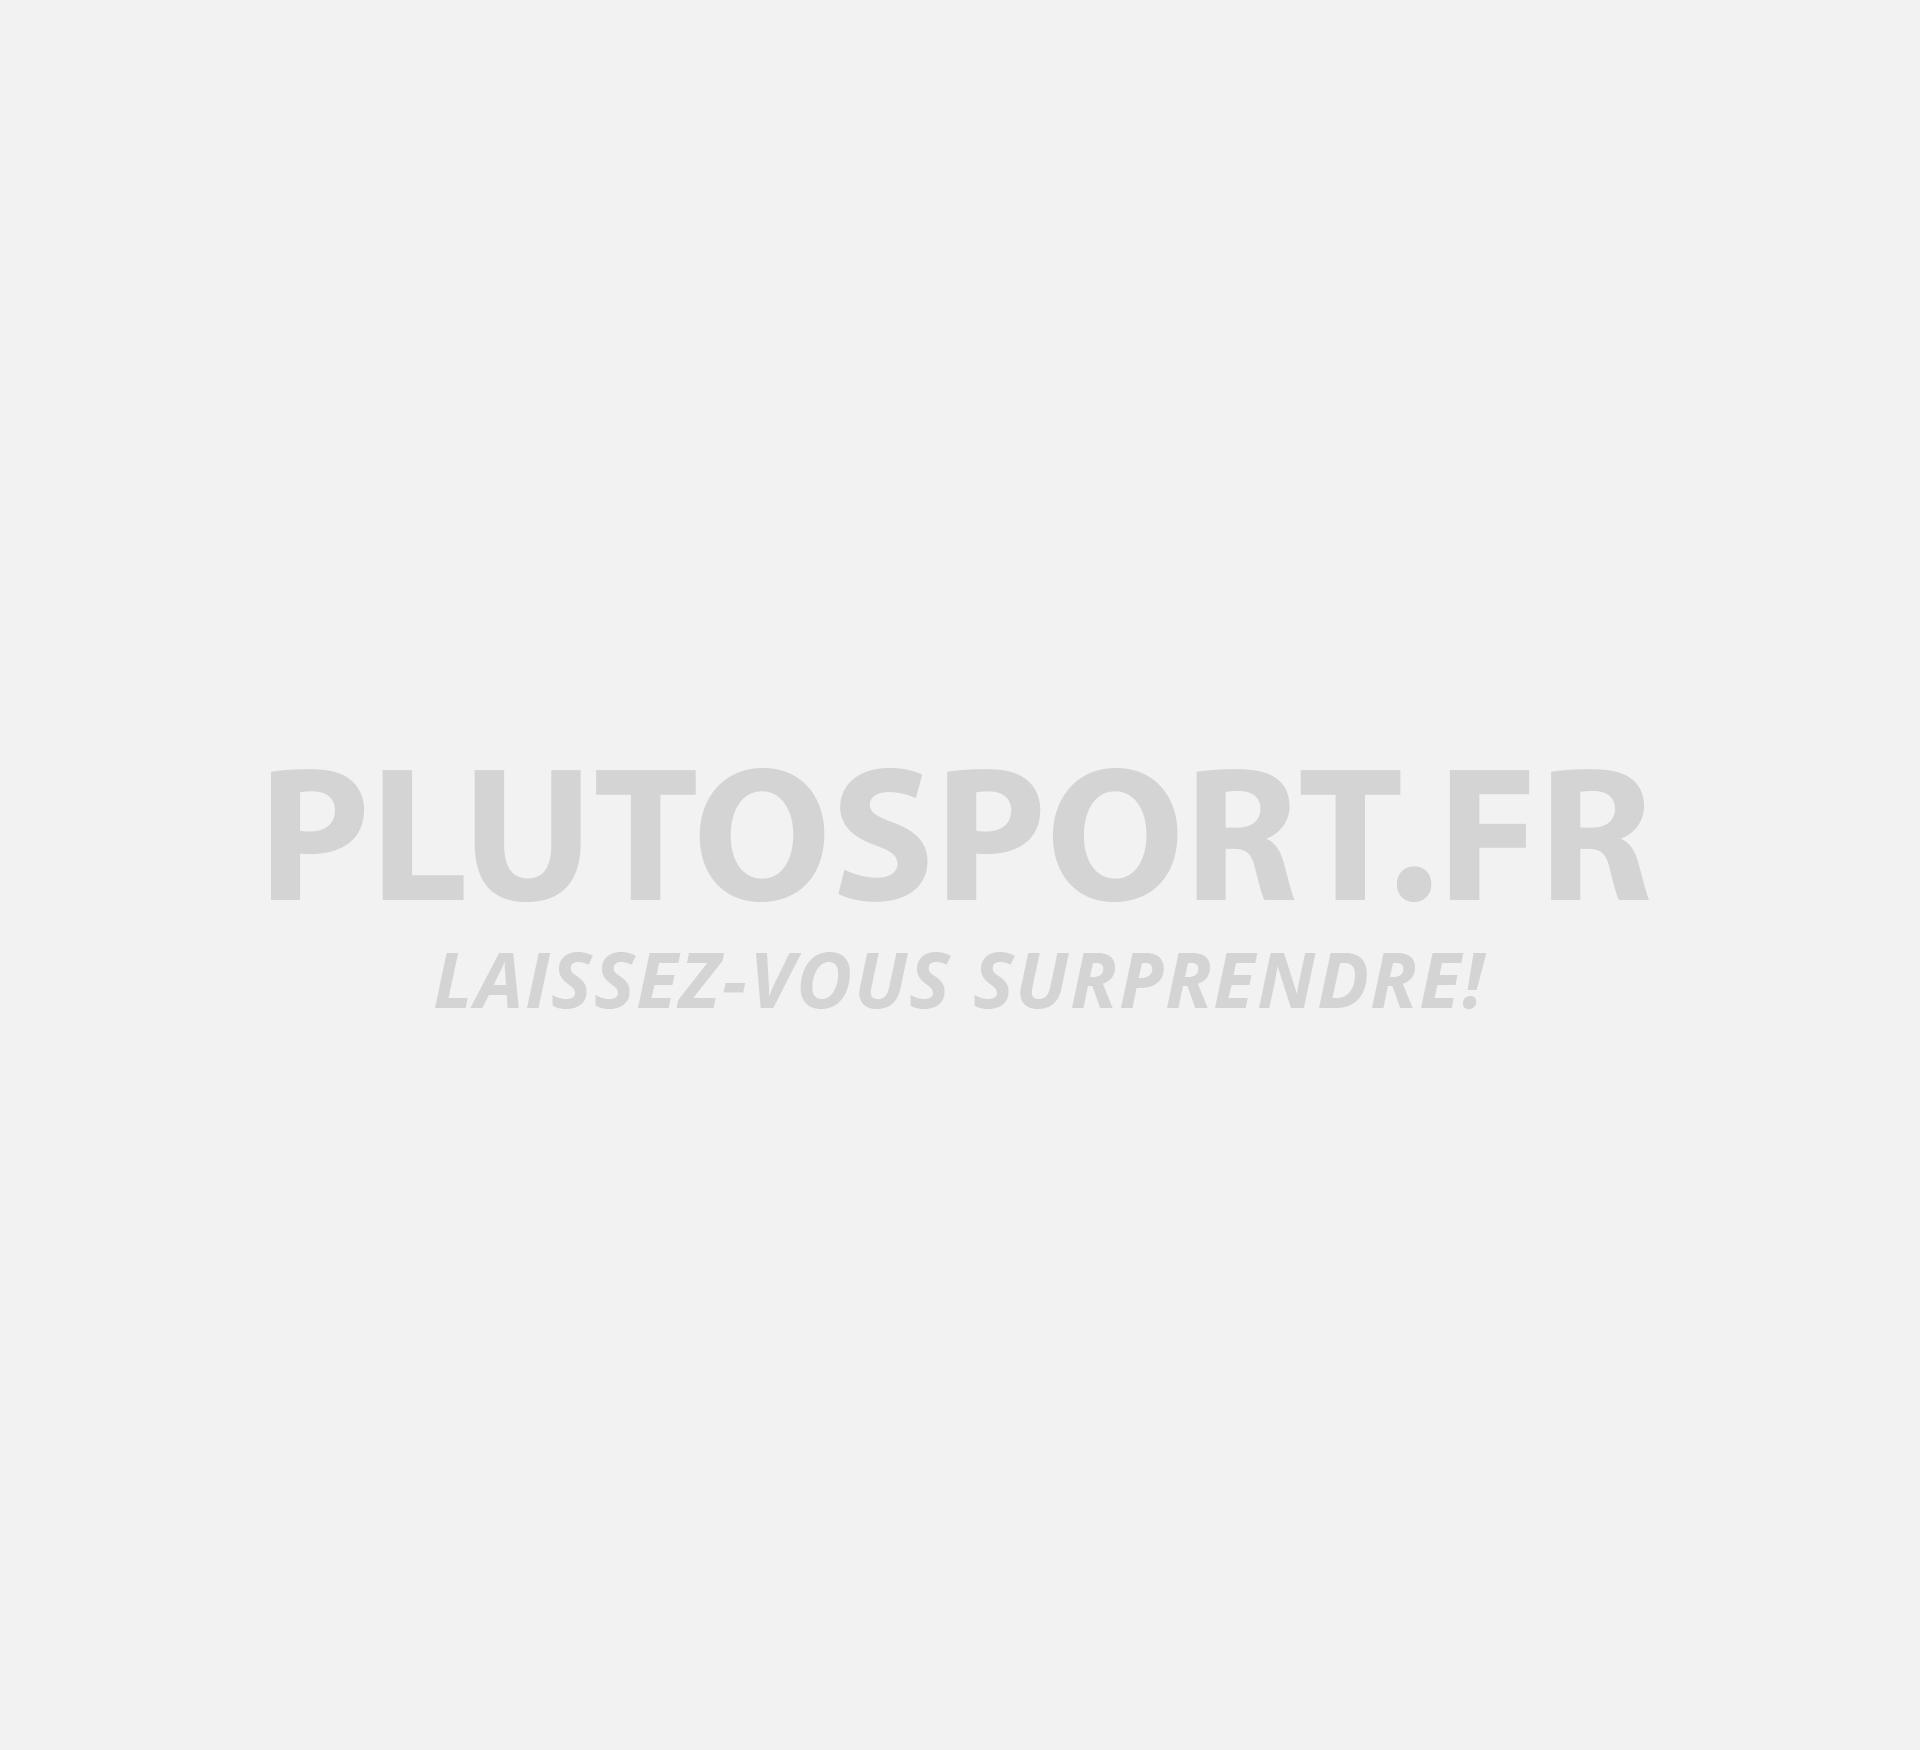 e435bf6058e Adidas Bidon - Bouteilles - Accessoires - Fitness - Enfants | Plutosport